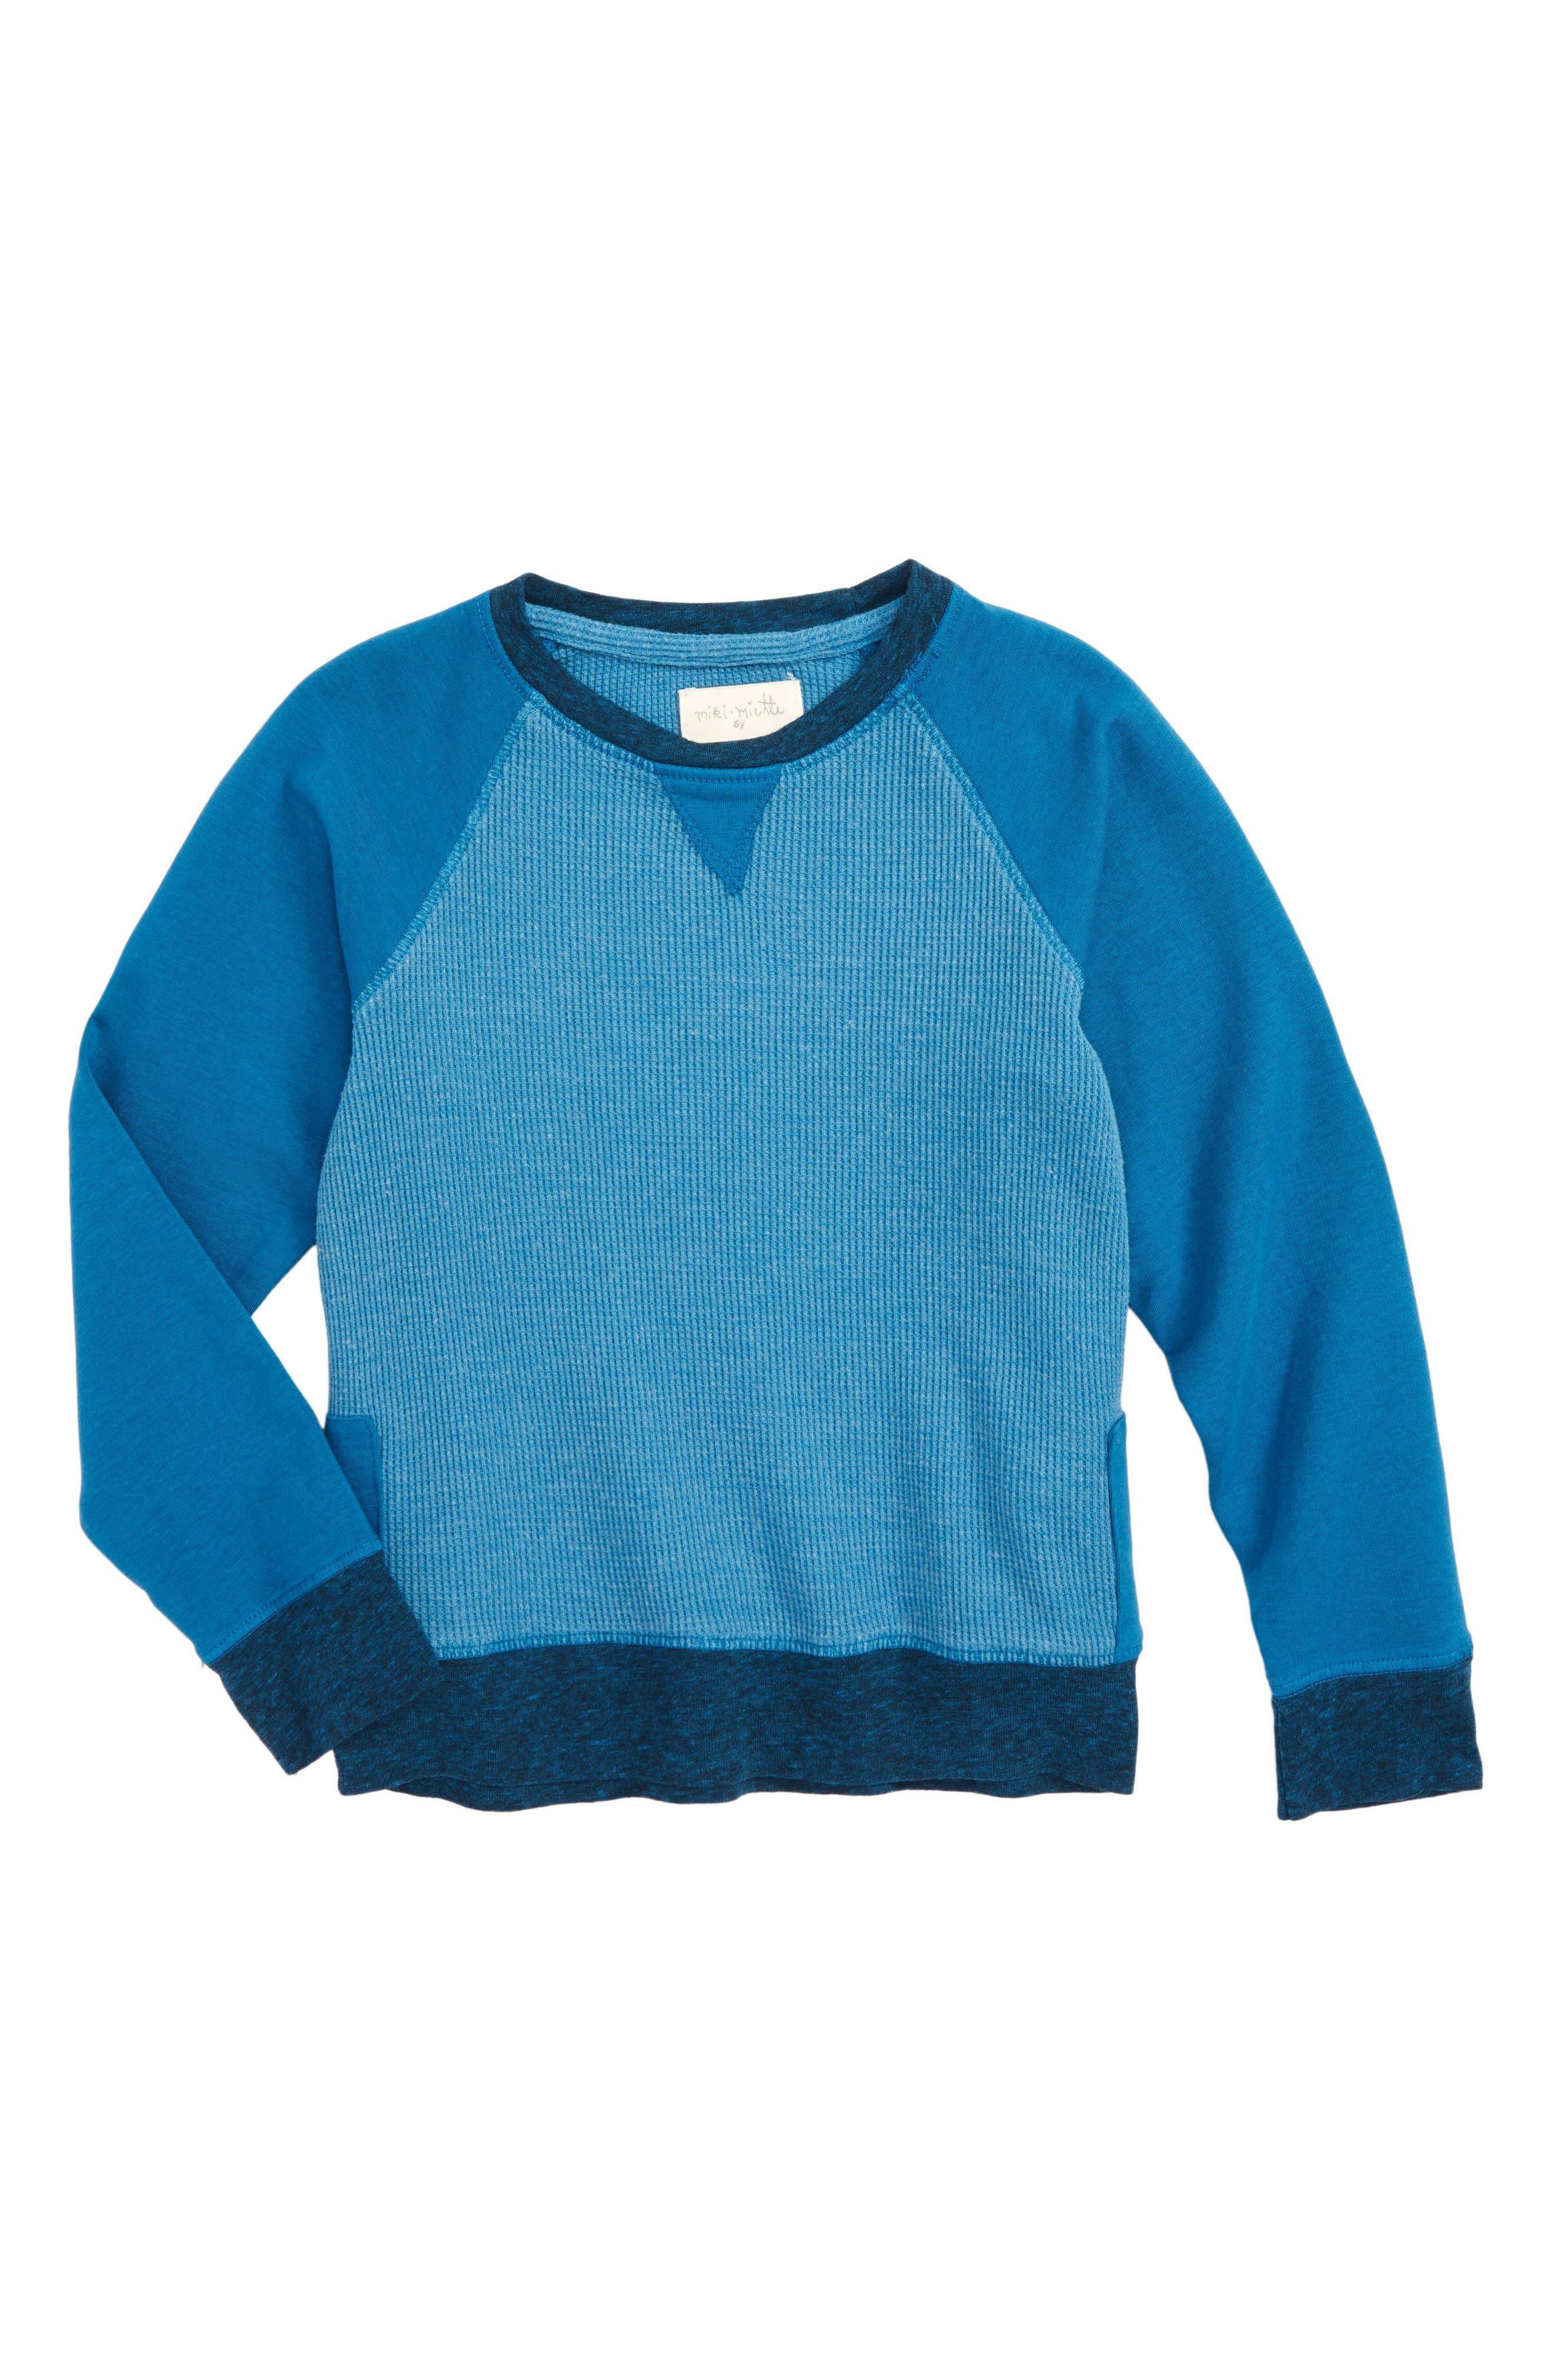 Miki Miette Iggy Sweatshirt (Toddler Boys, Little Boys & Big Boys)